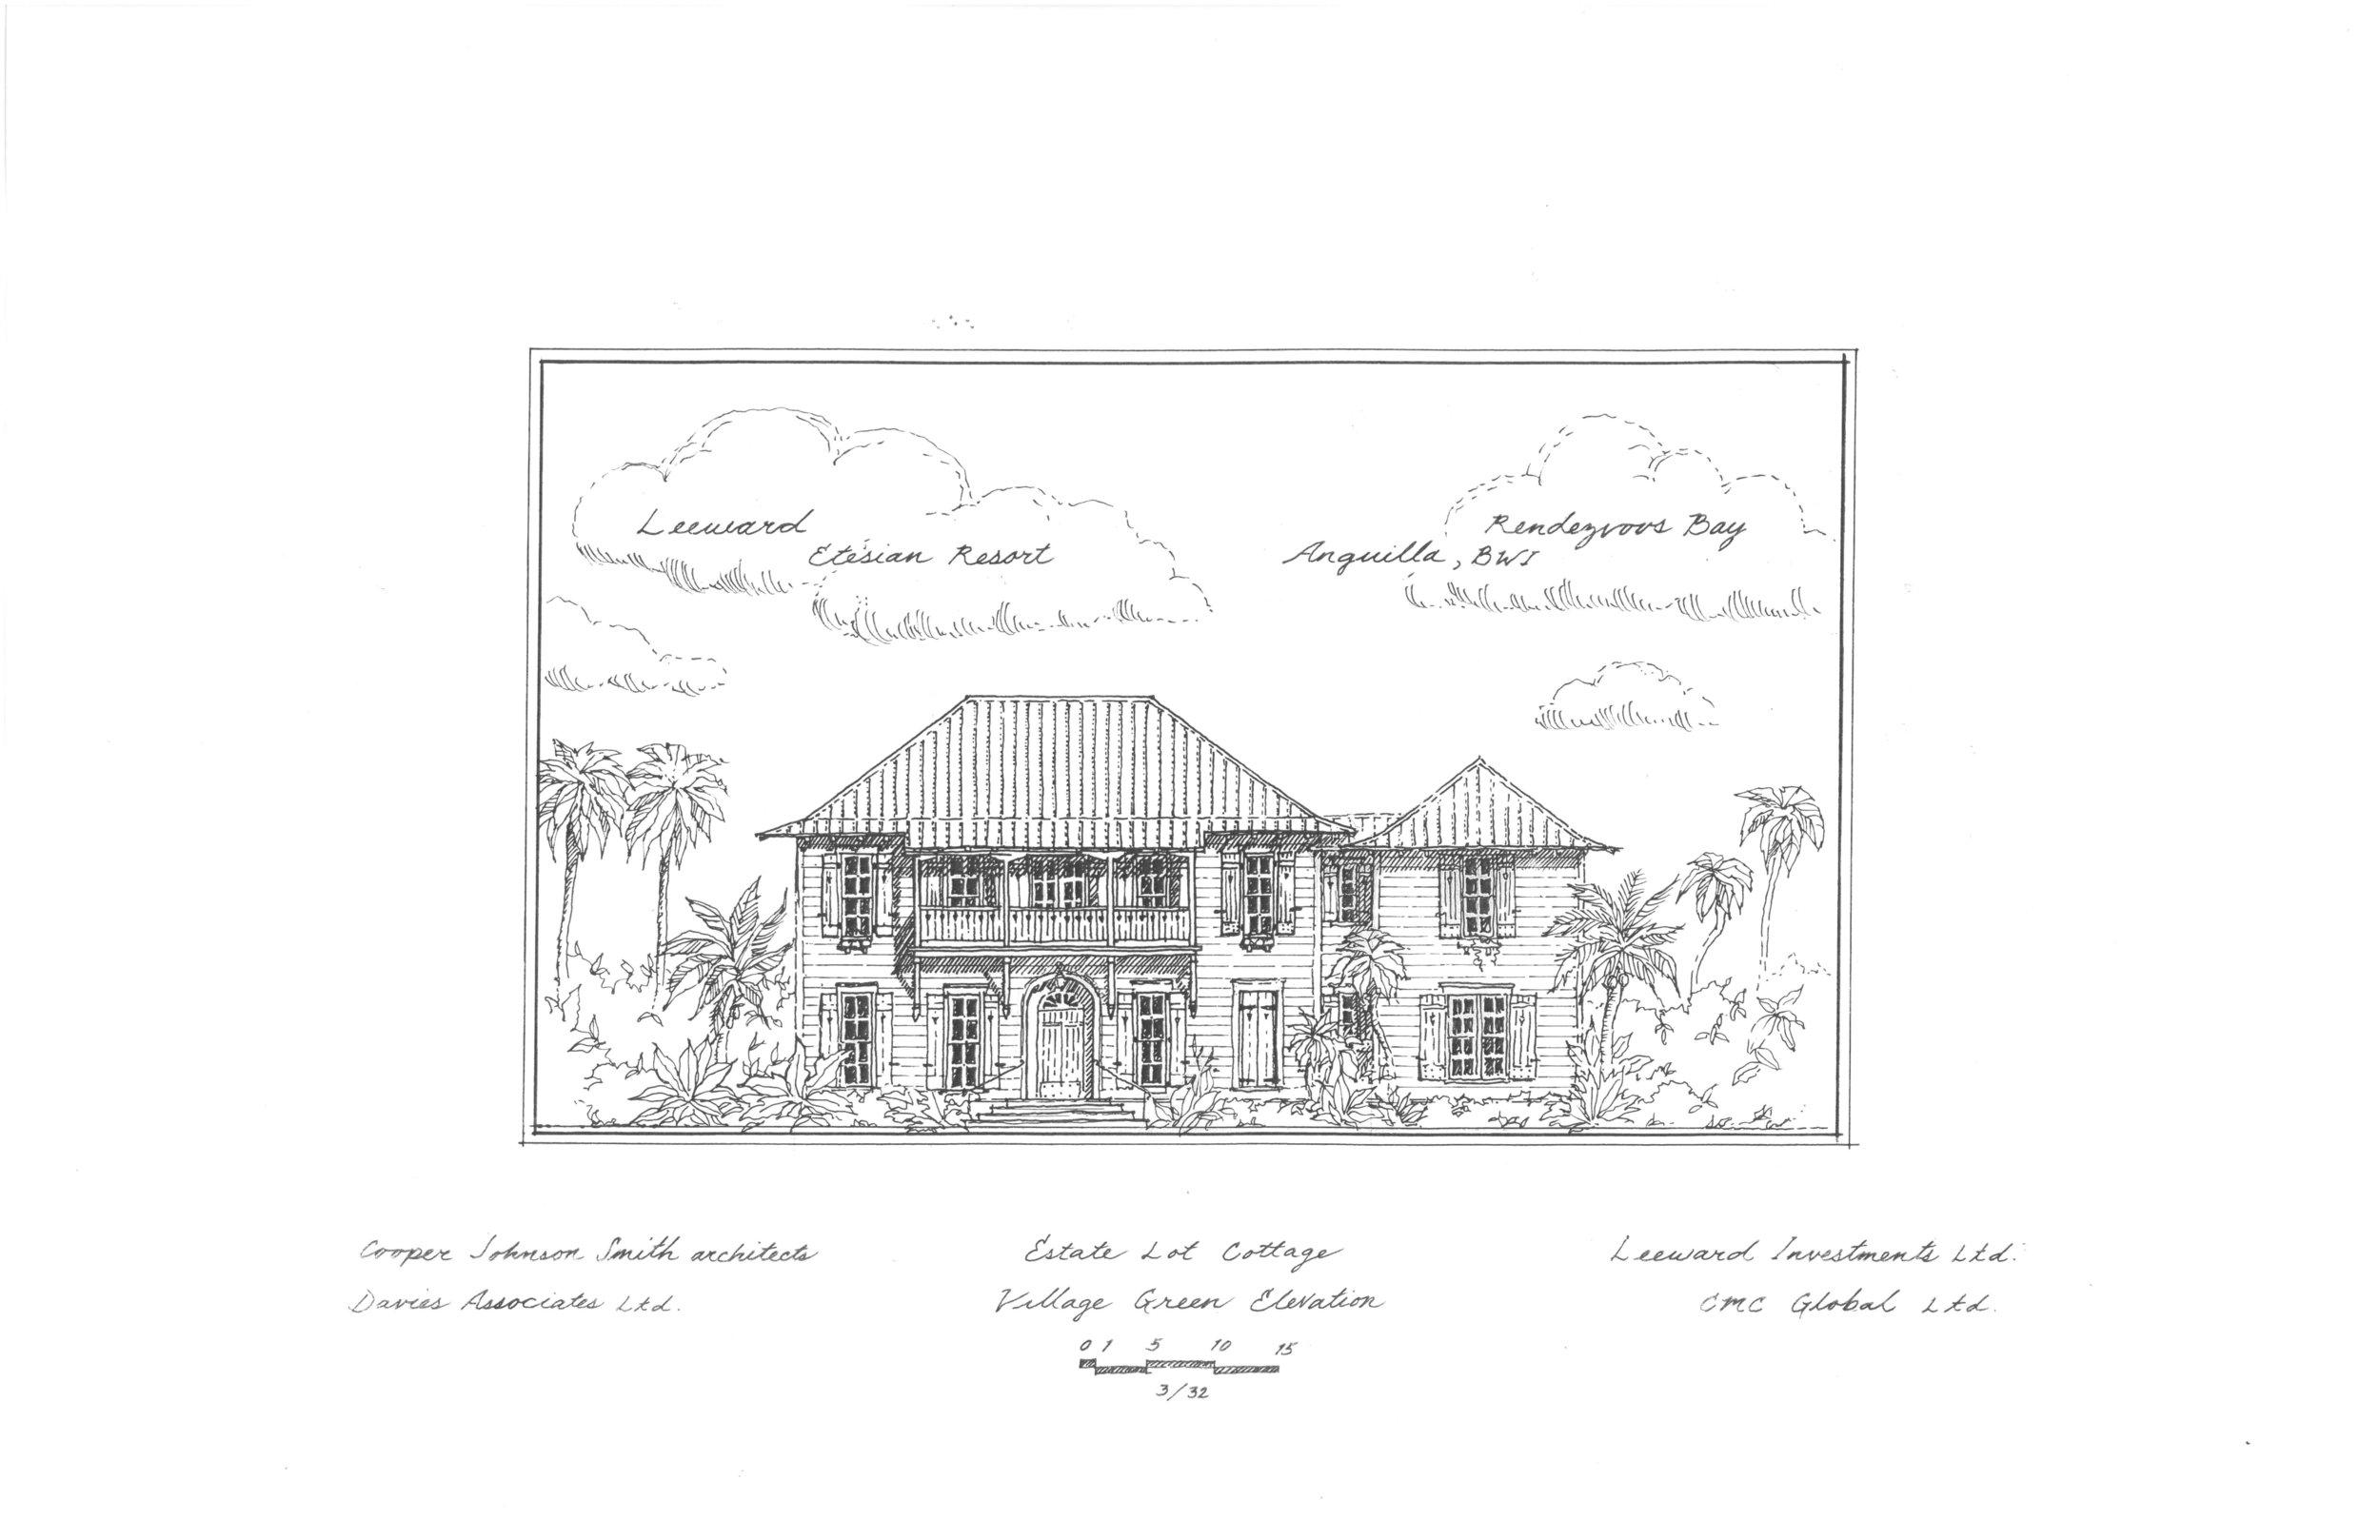 Estate House front.jpg